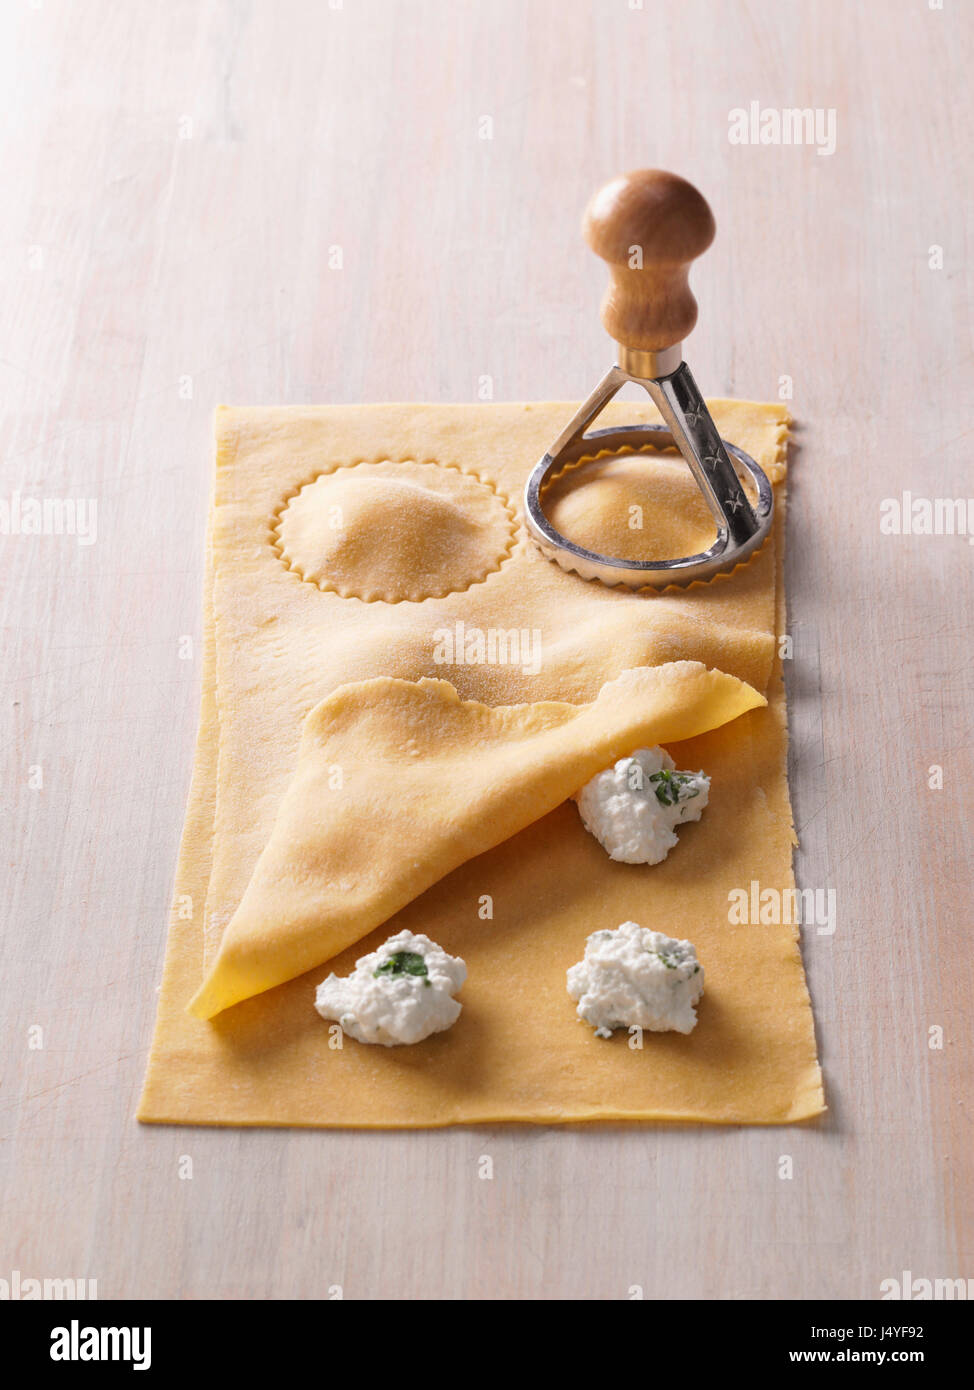 Step Ravioli Preparation Cut With A Pasta Stamp